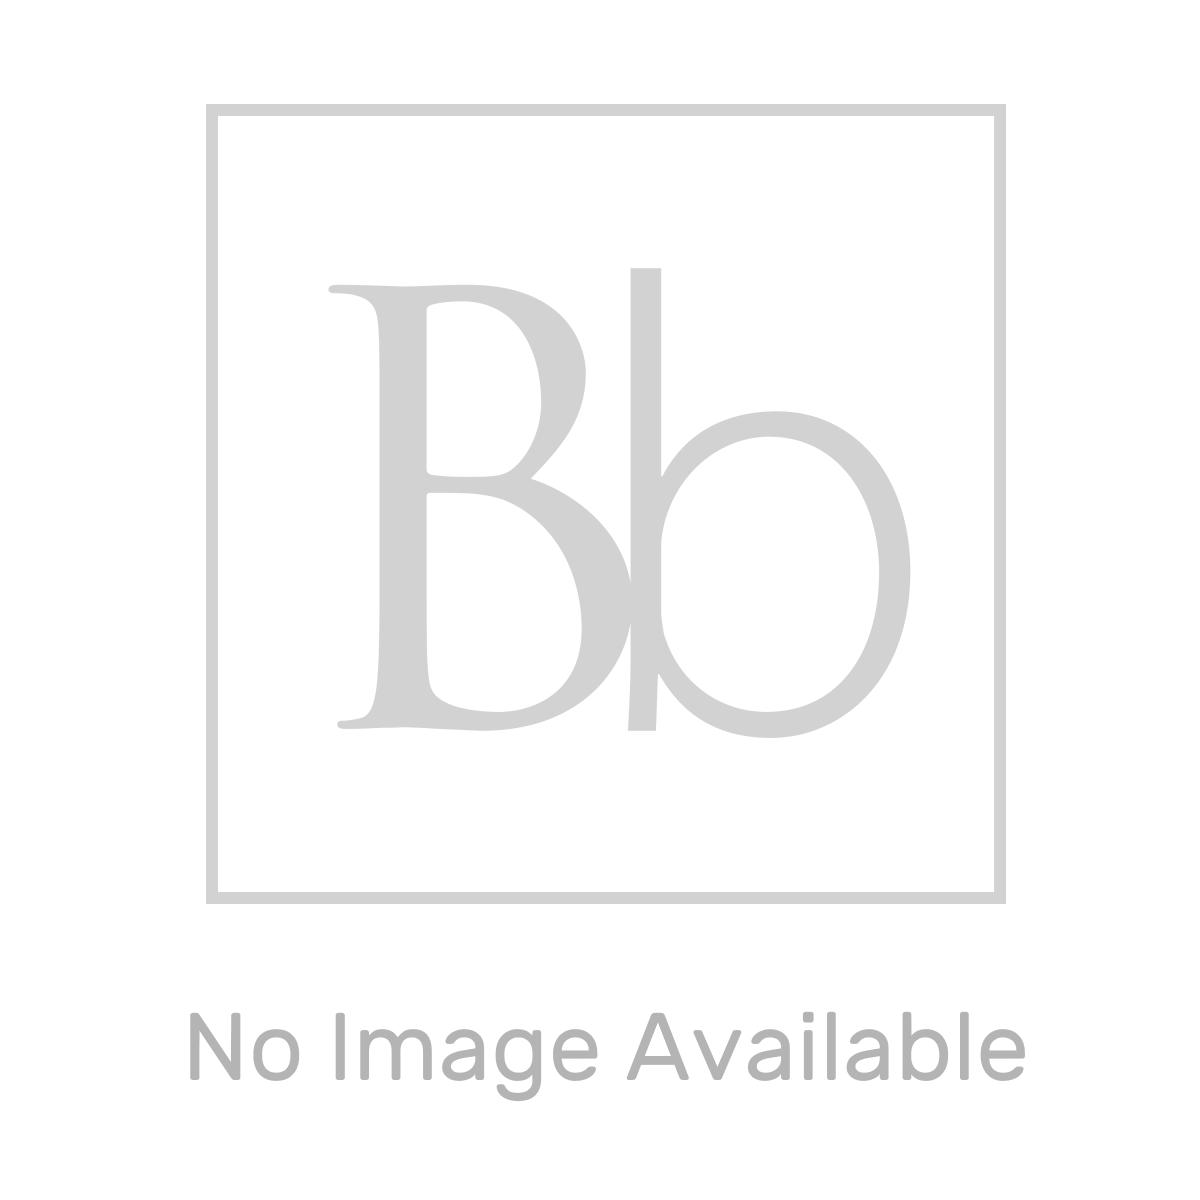 RAK Resort En-Suite with Single Door Quadrant Shower Enclosure Recess